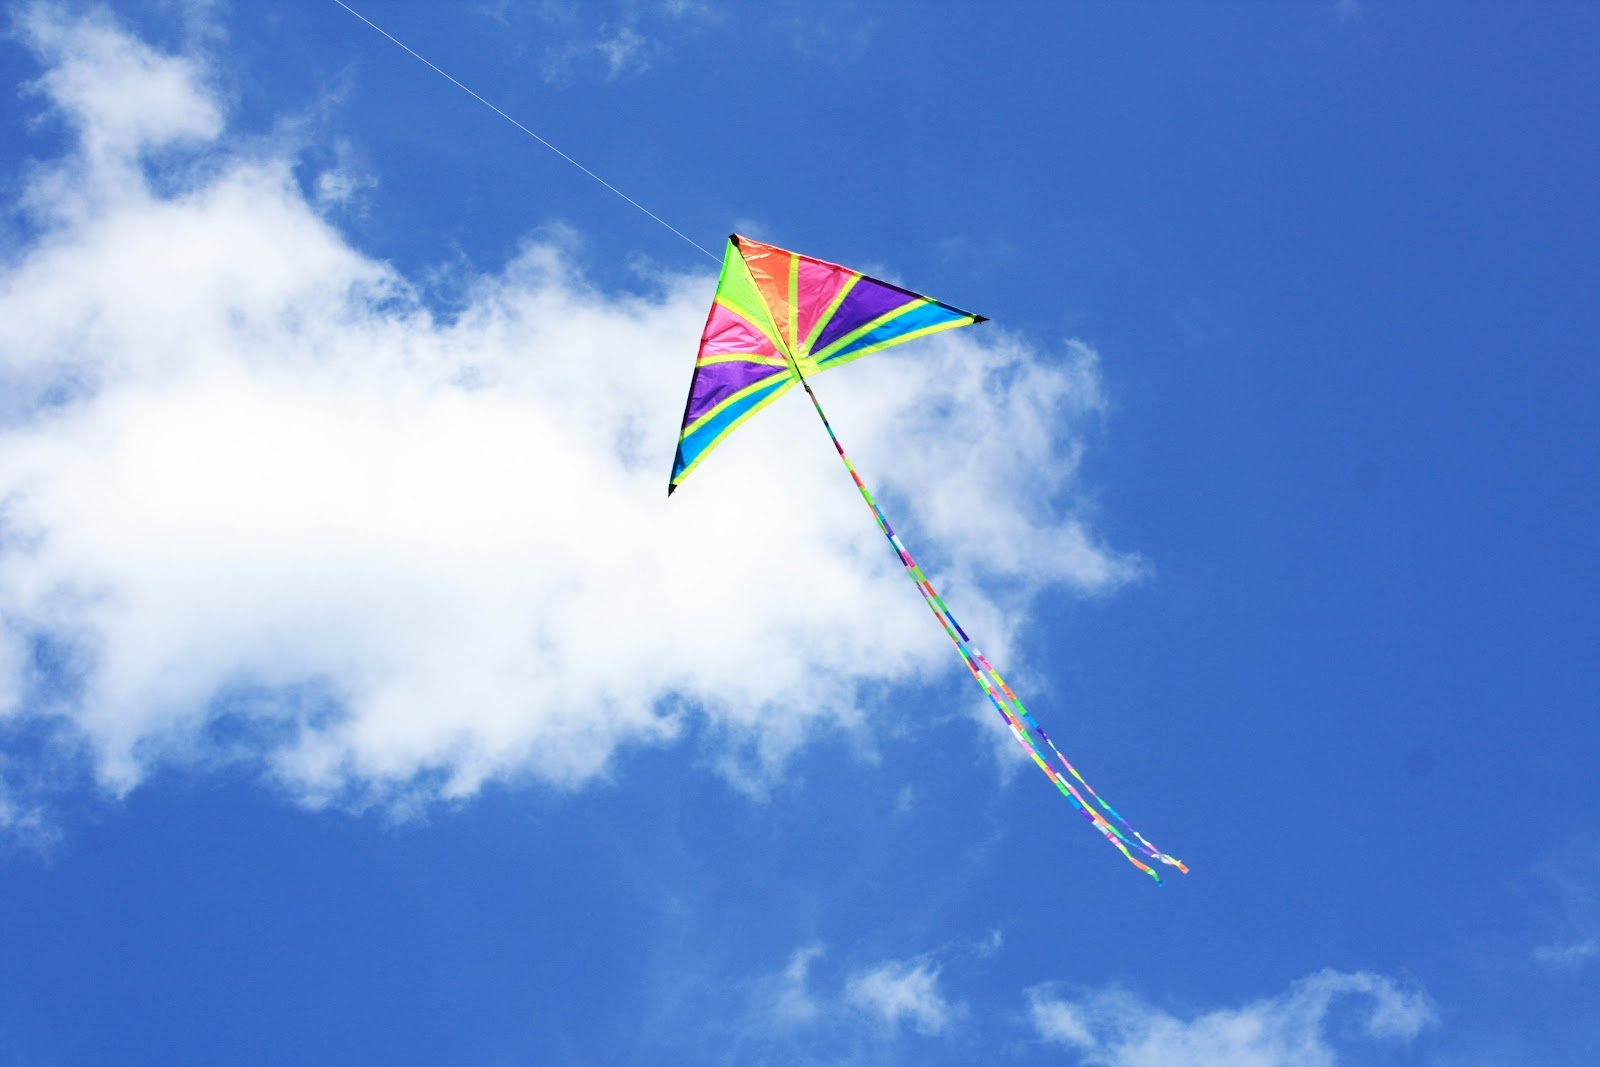 Child Wallpaper Hd Kite Flying Bokeh Flight Fly Summer Hobby Sport Sky Toy